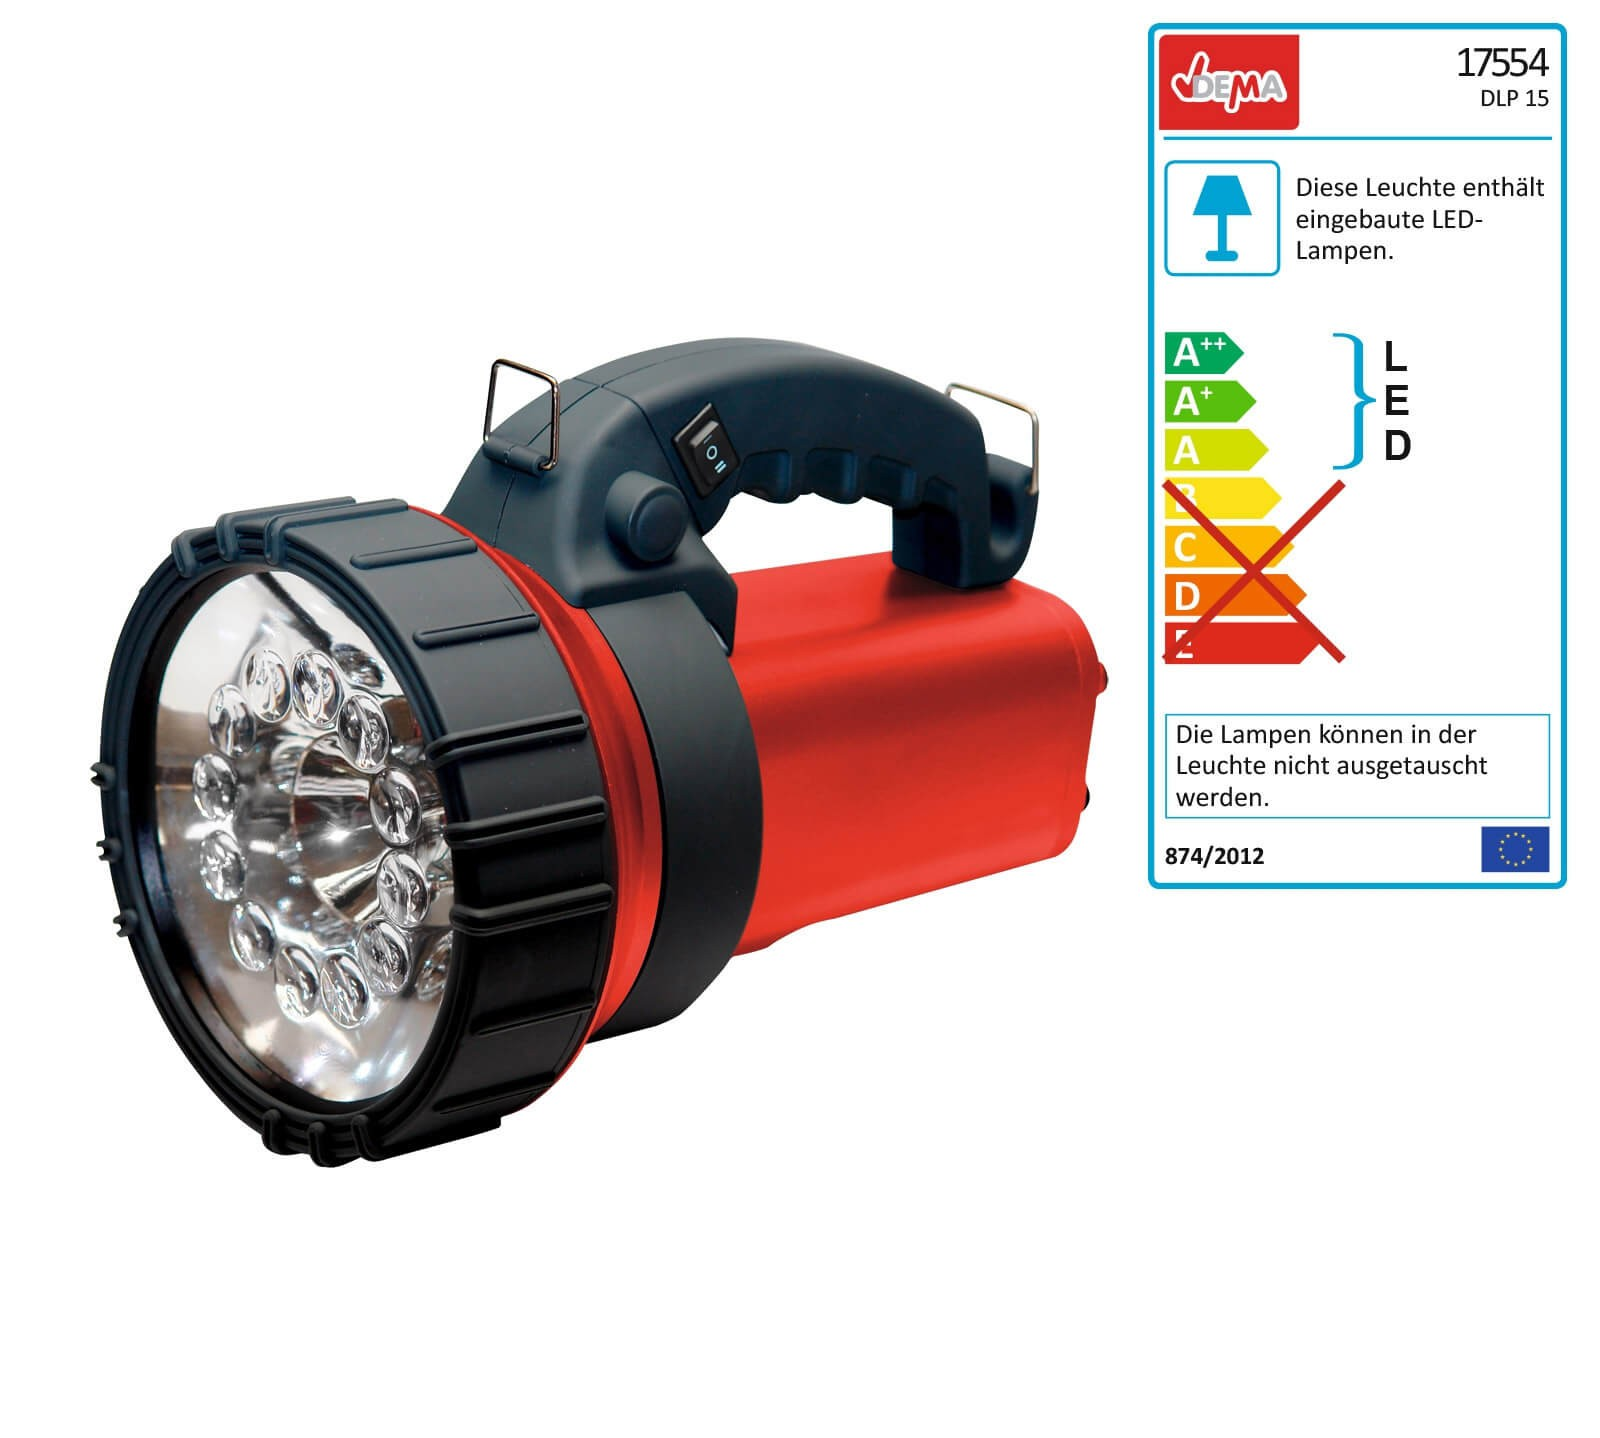 Dema LED Lampe / Campinglampe 15000MCD 17554